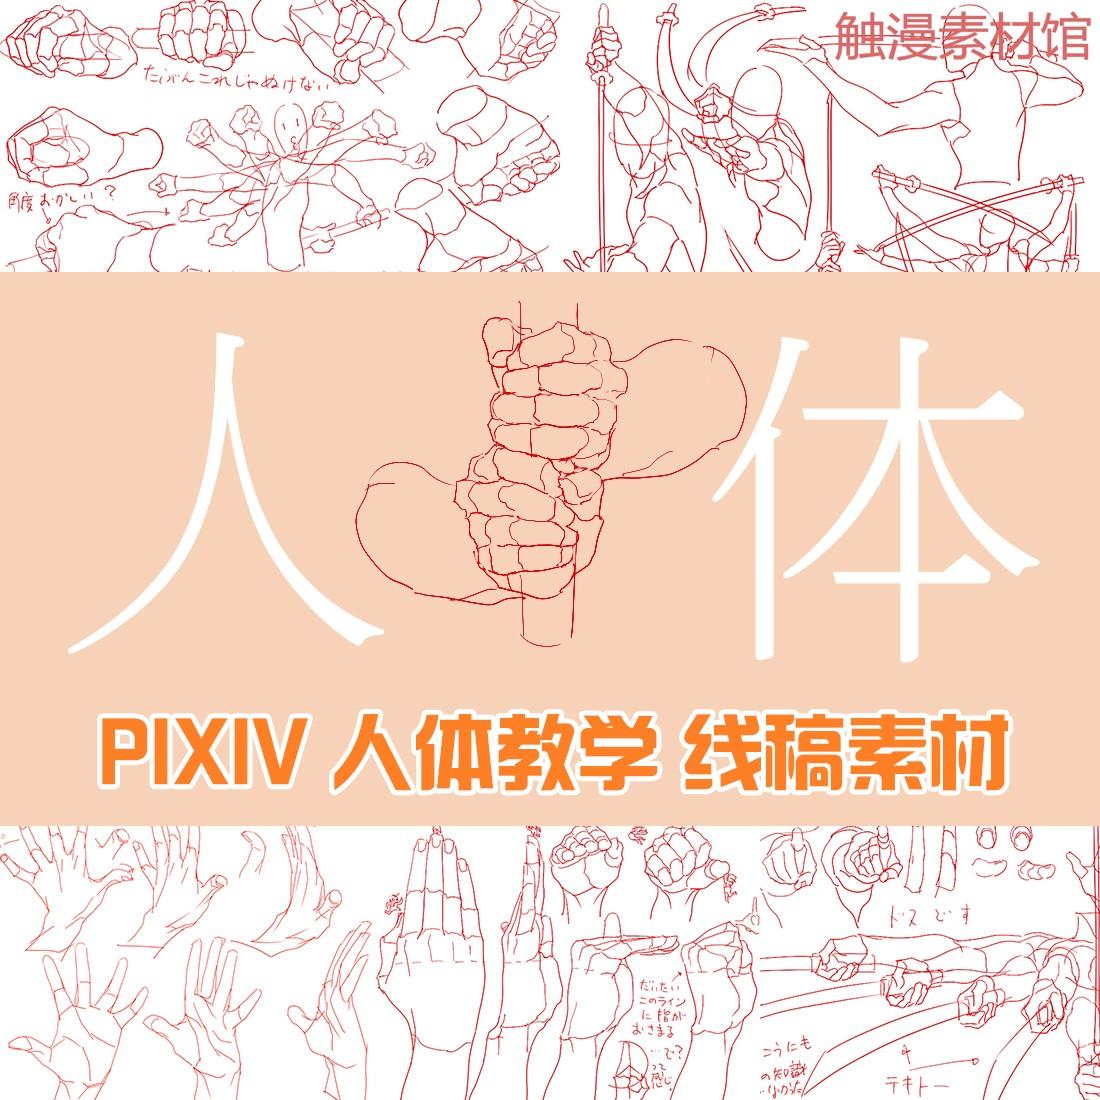 PIXIV人体结构线稿 人体动态姿态 漫画速写 动画 绘画临摹素材,可领取元淘宝优惠券